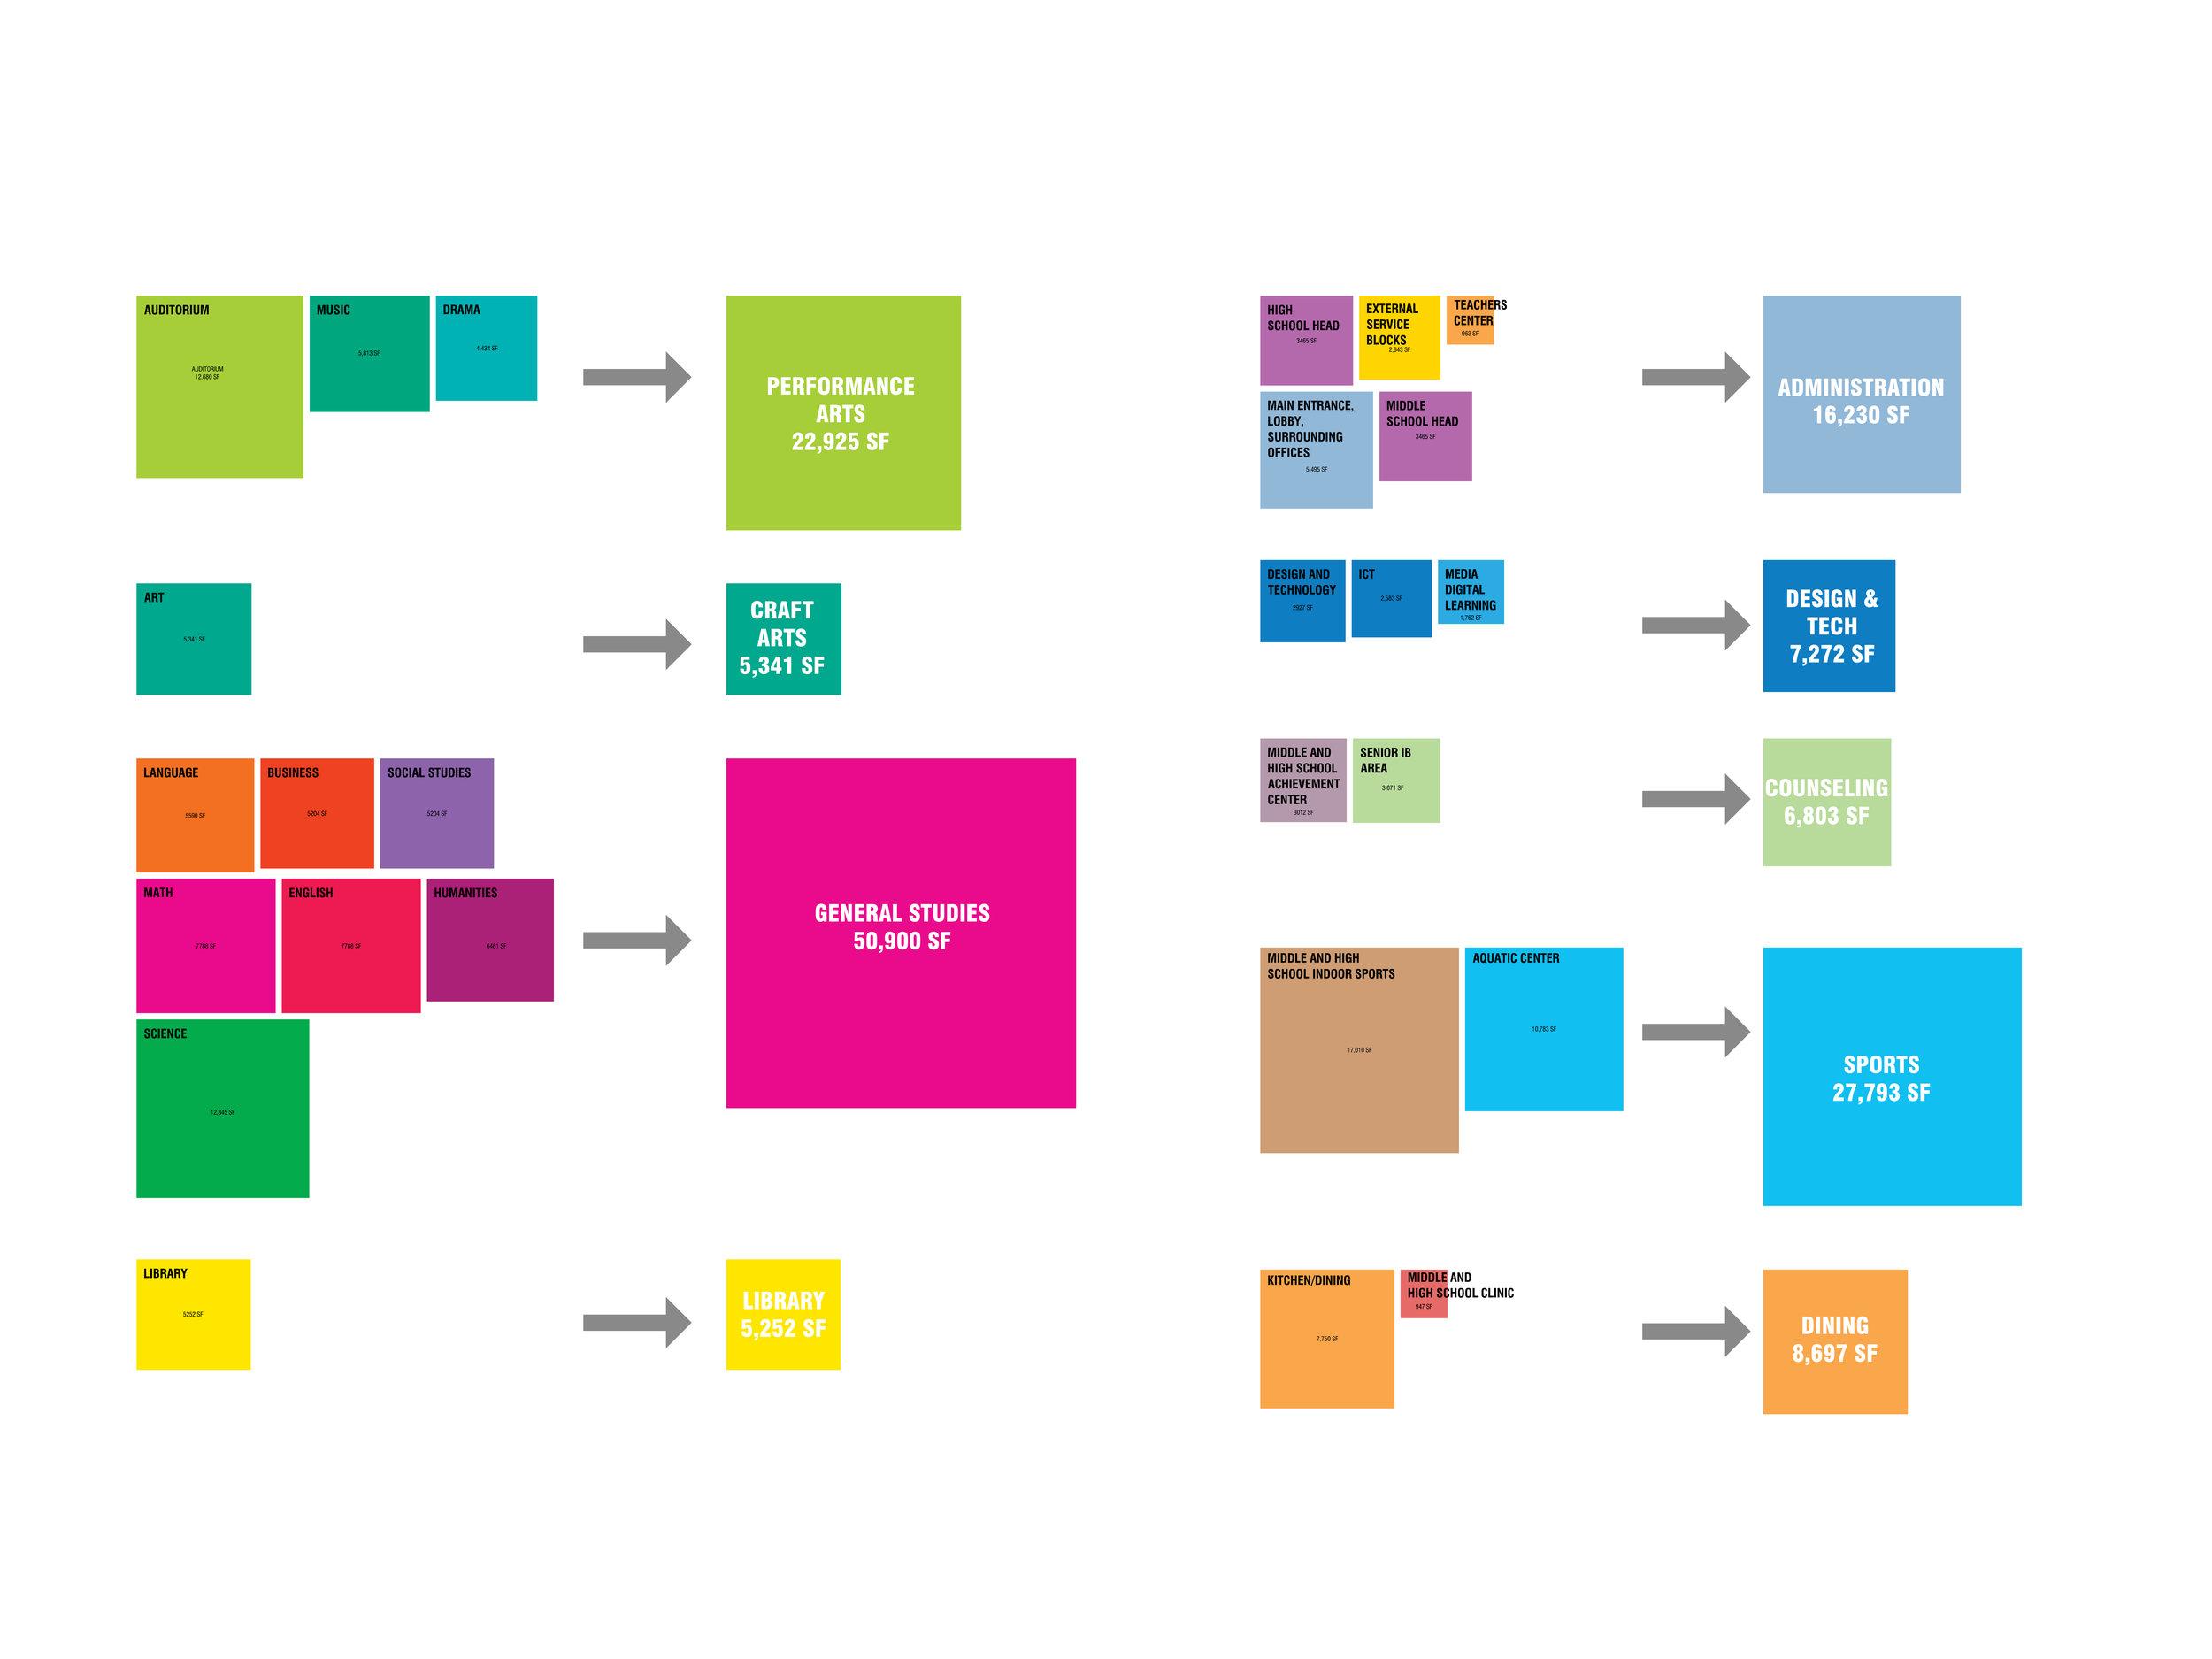 Program Consolidation Diagram